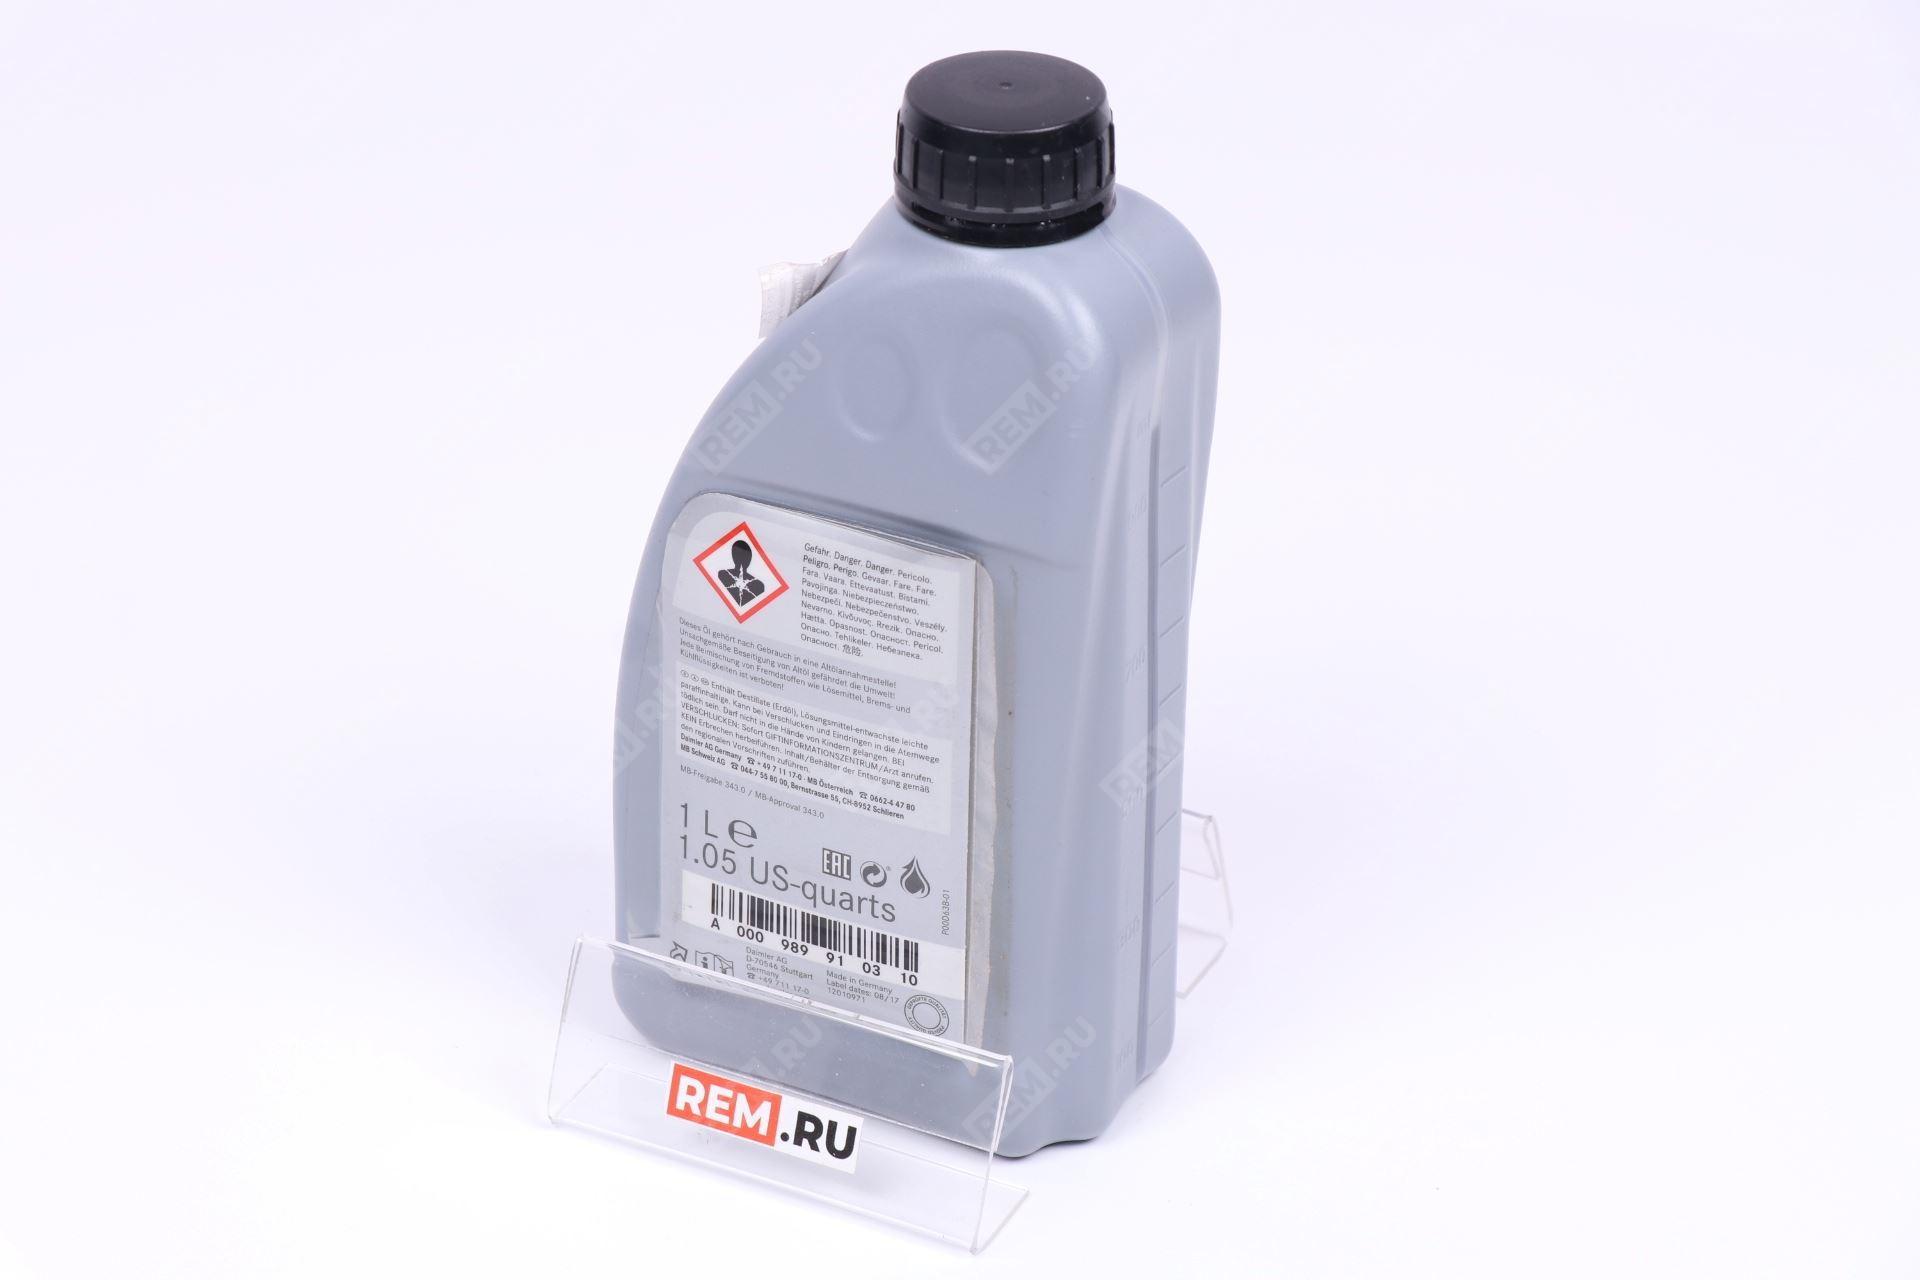 Масло гидравлическое Mercedes ZH-M, 1Л A000989910310